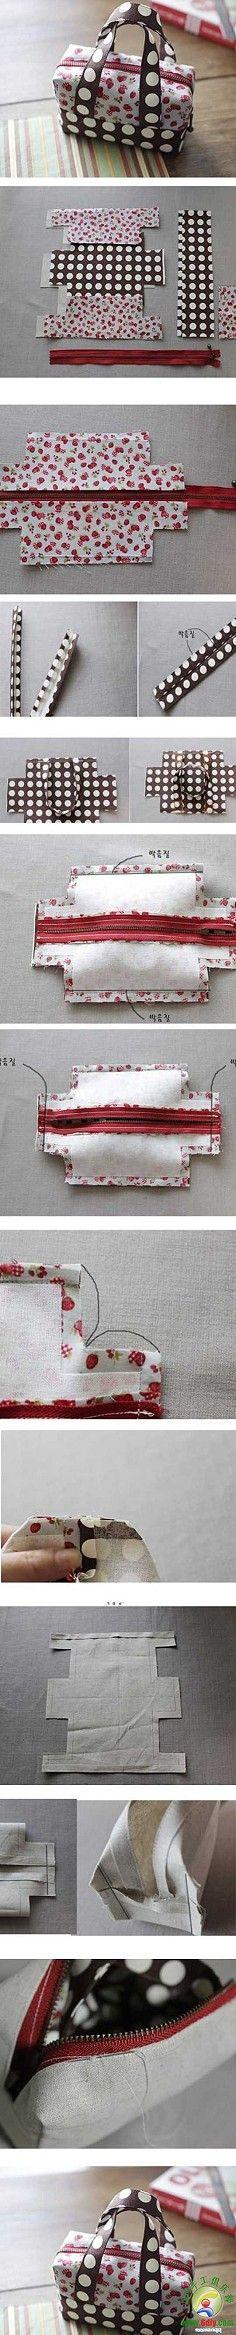 DIY: envelope/rectangle bag